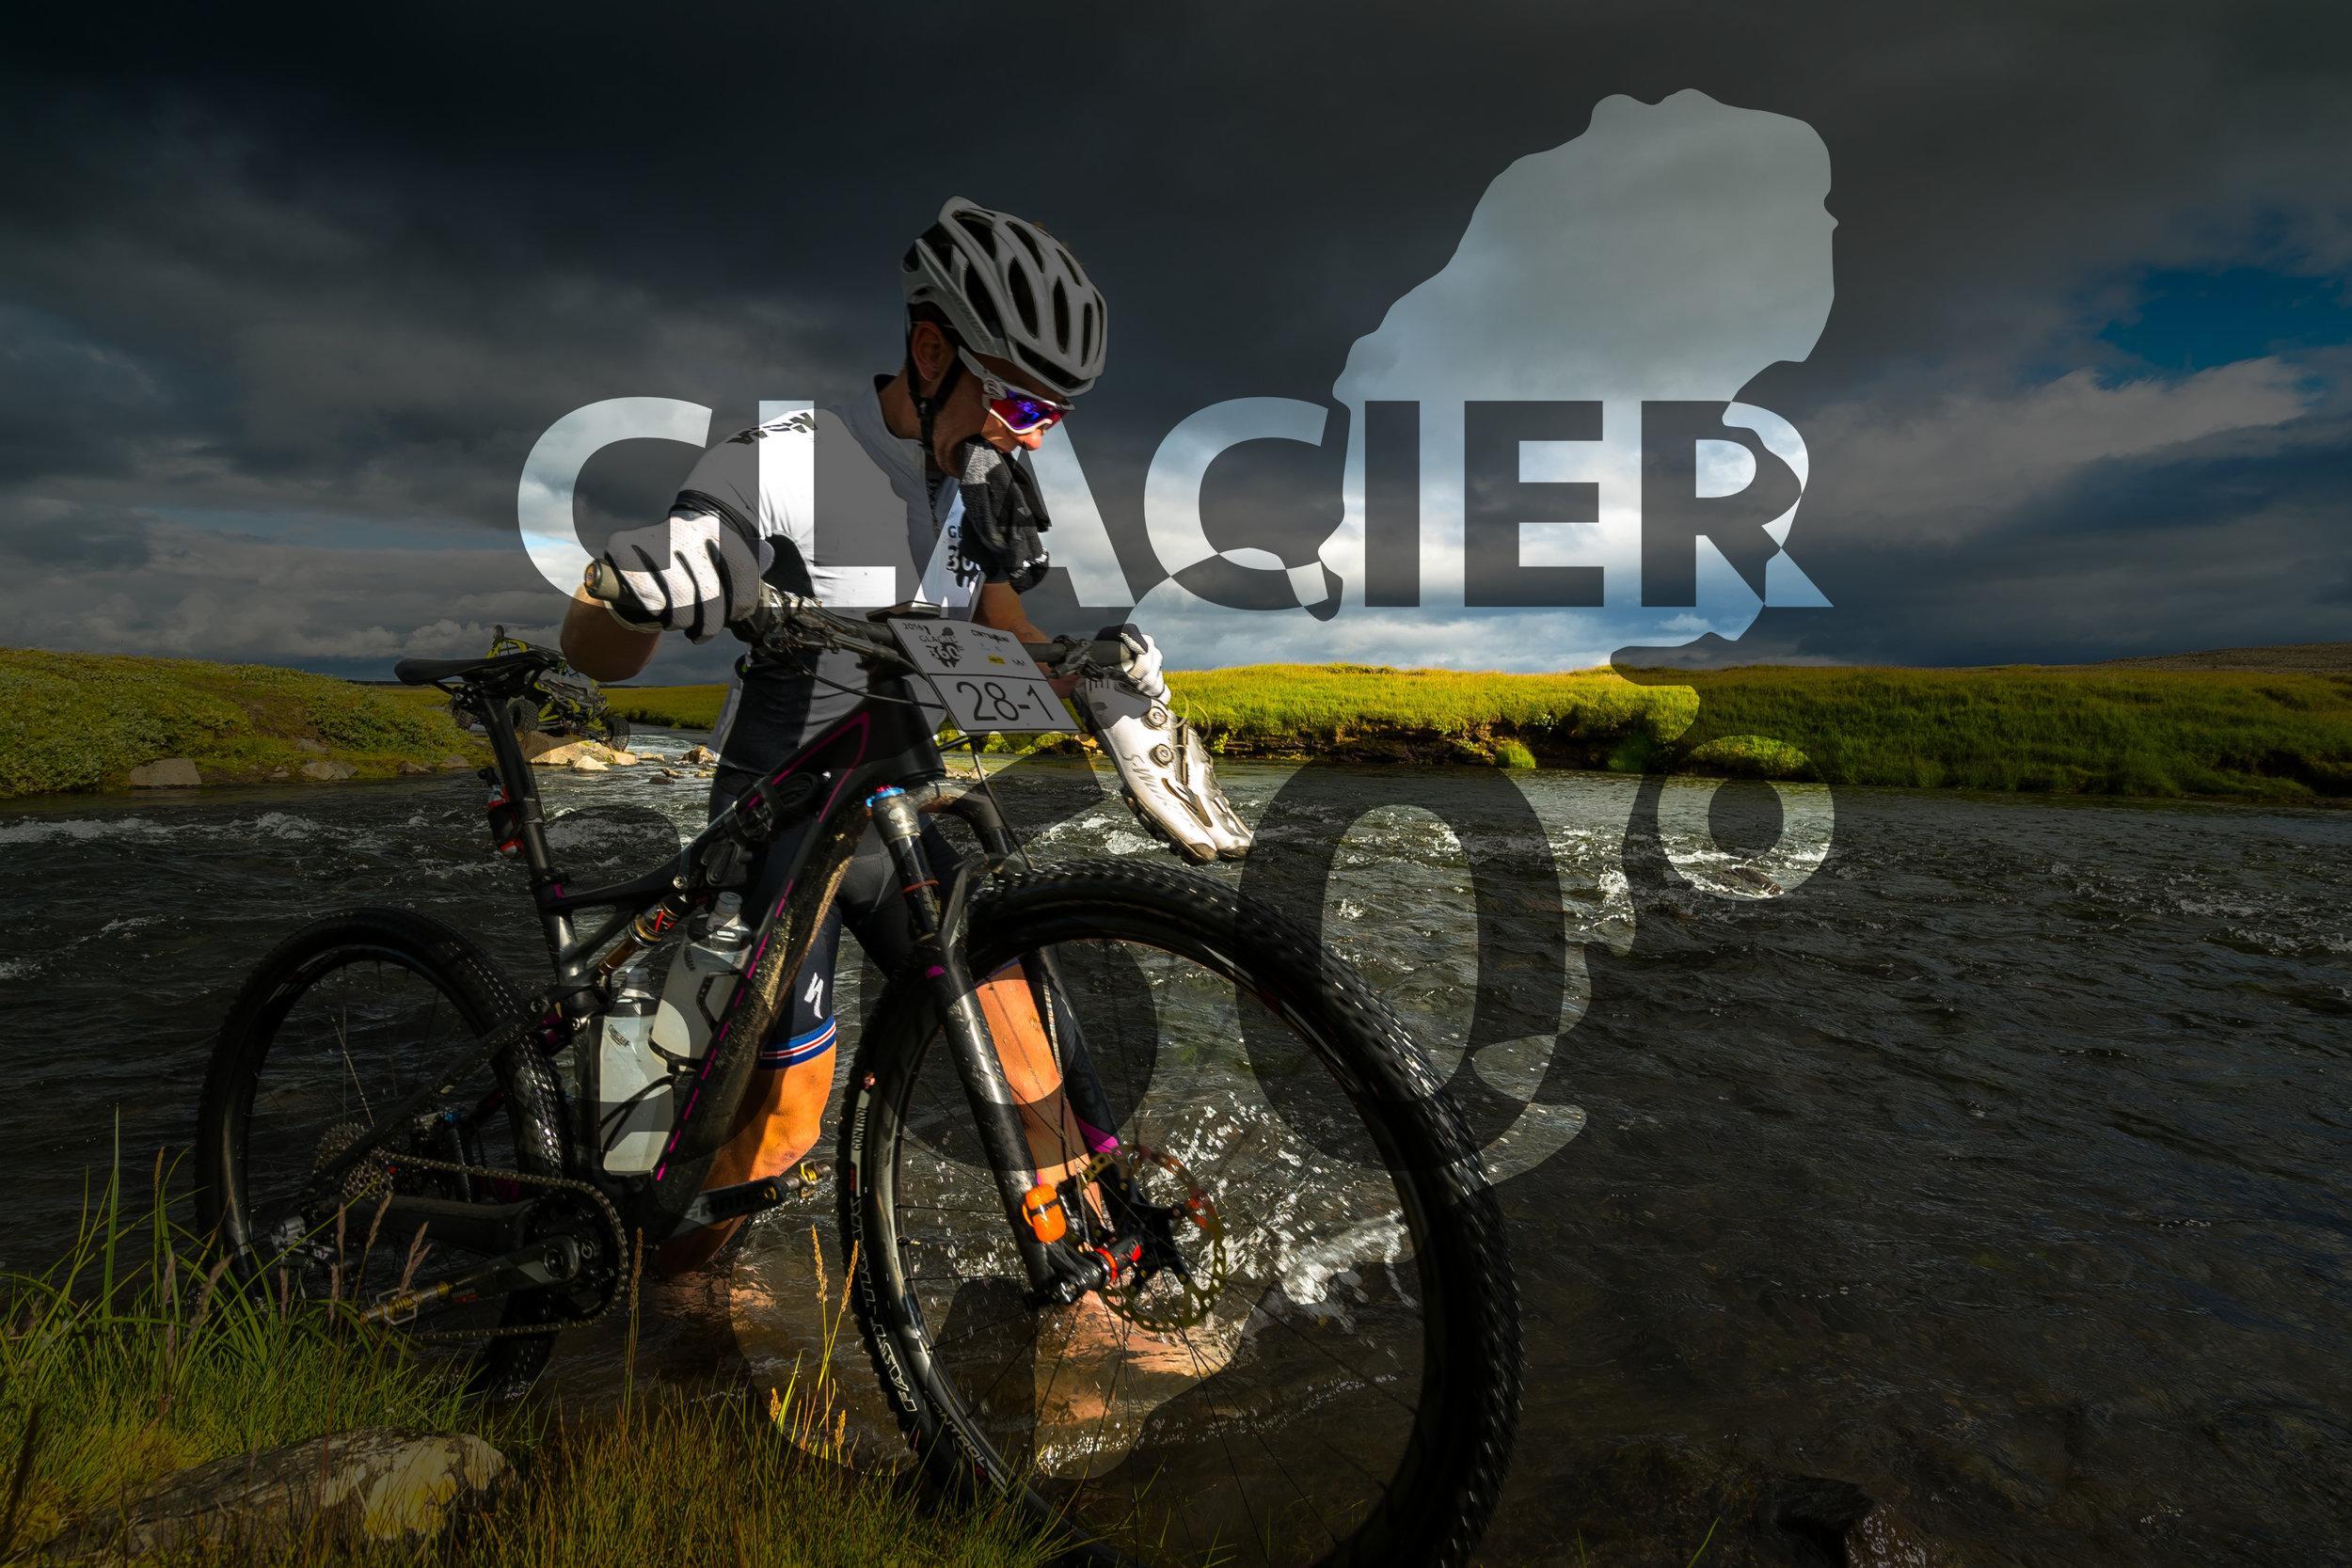 Glacier 360 logo overlay Snorri Þór Tryggvason-DSC00849.jpg